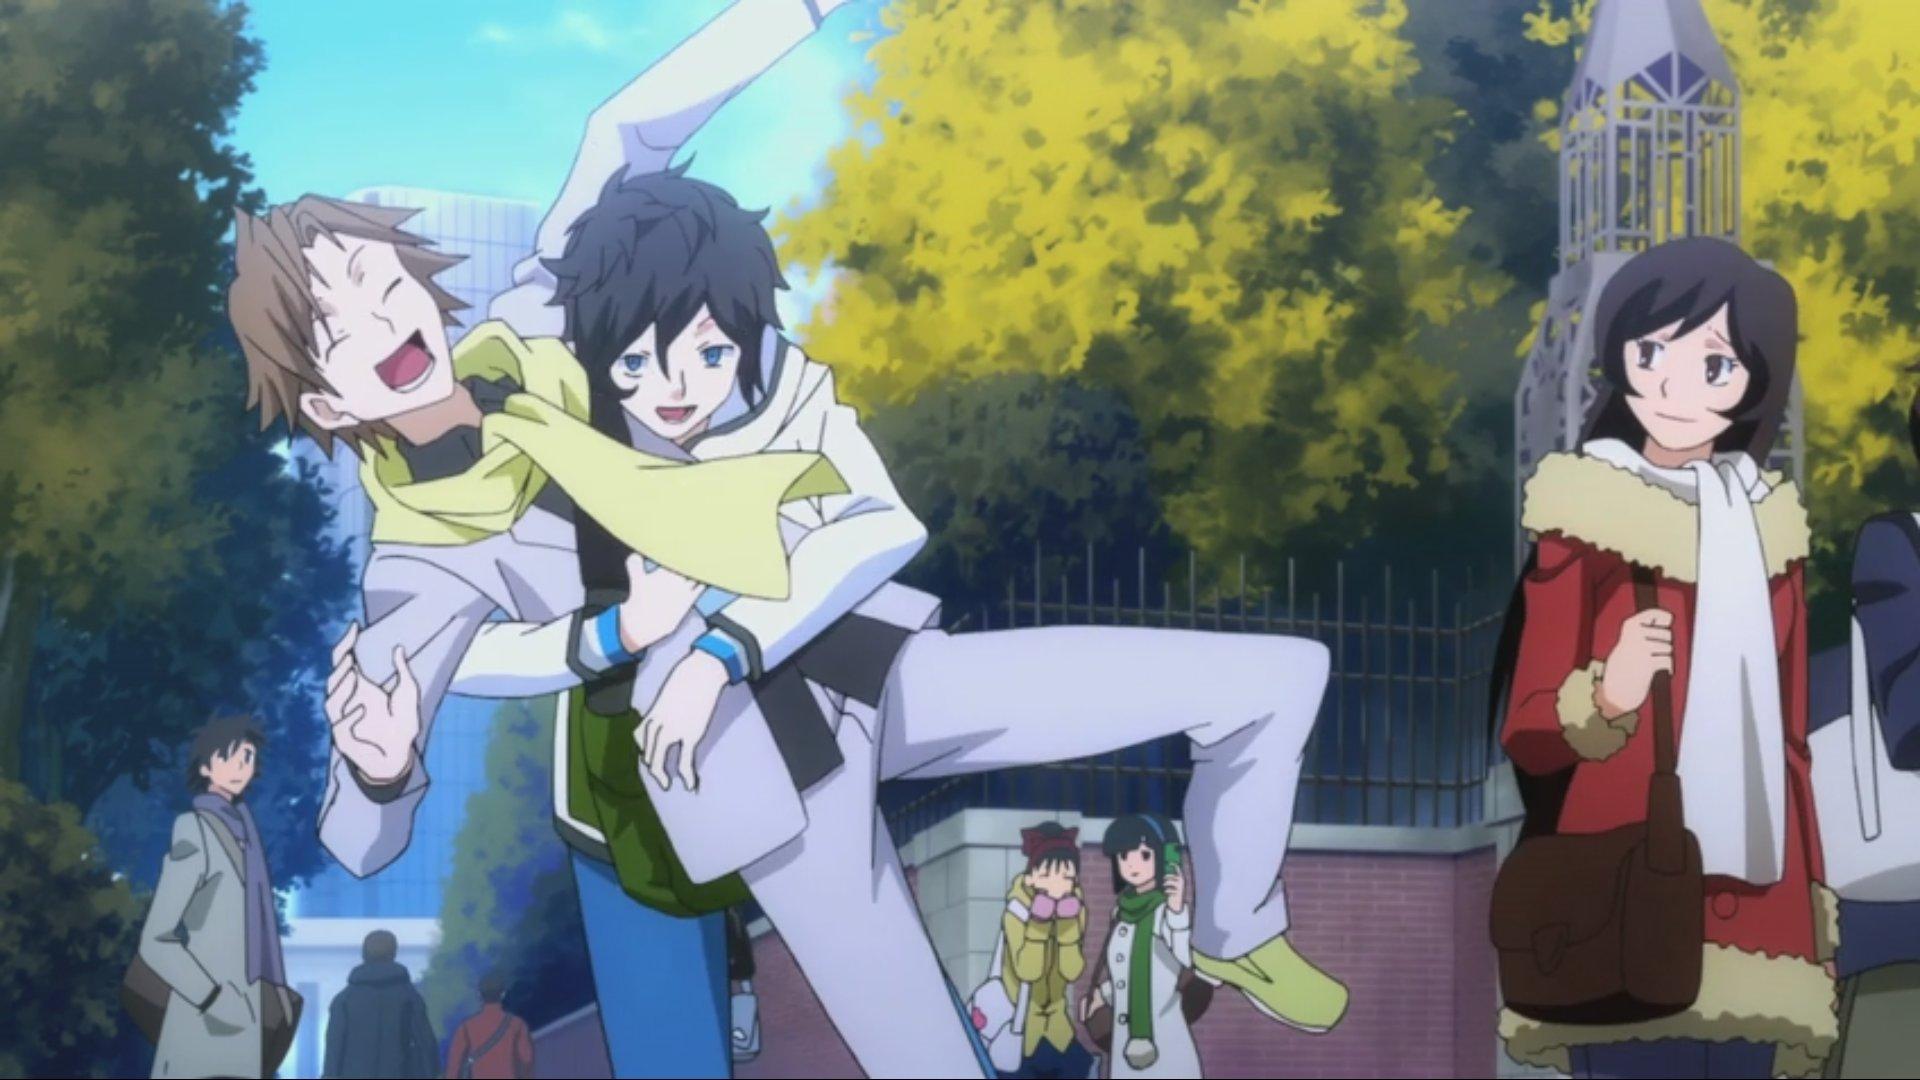 Devil Survivor 2 Anime Characters : Devil survivor the animation episode lura s anime